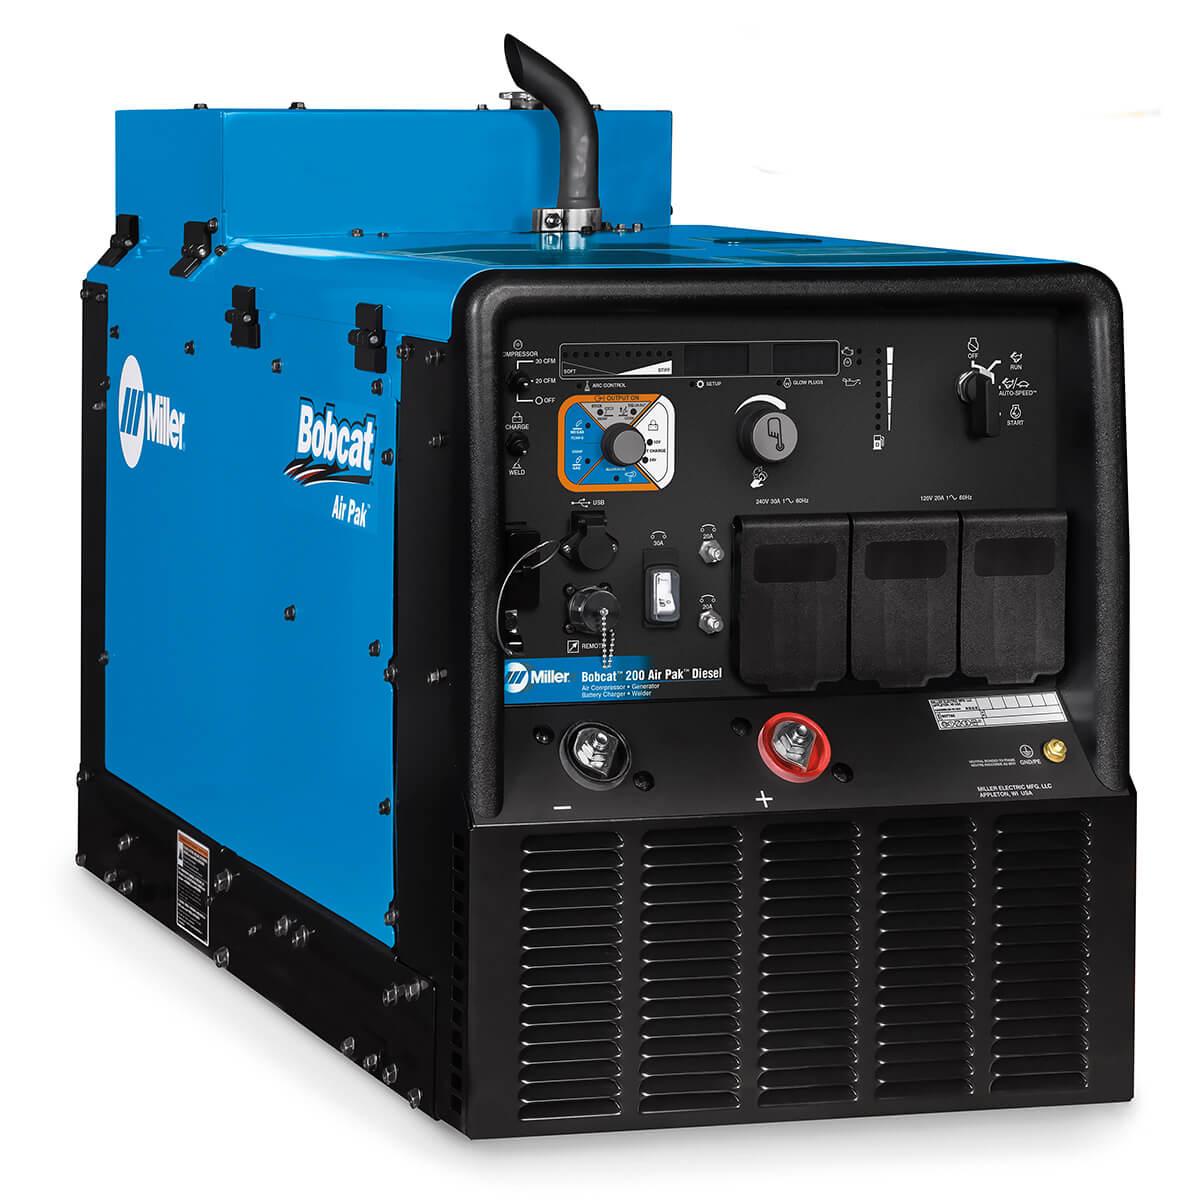 BOBCAT 200 AIR PAK Diesel 907760